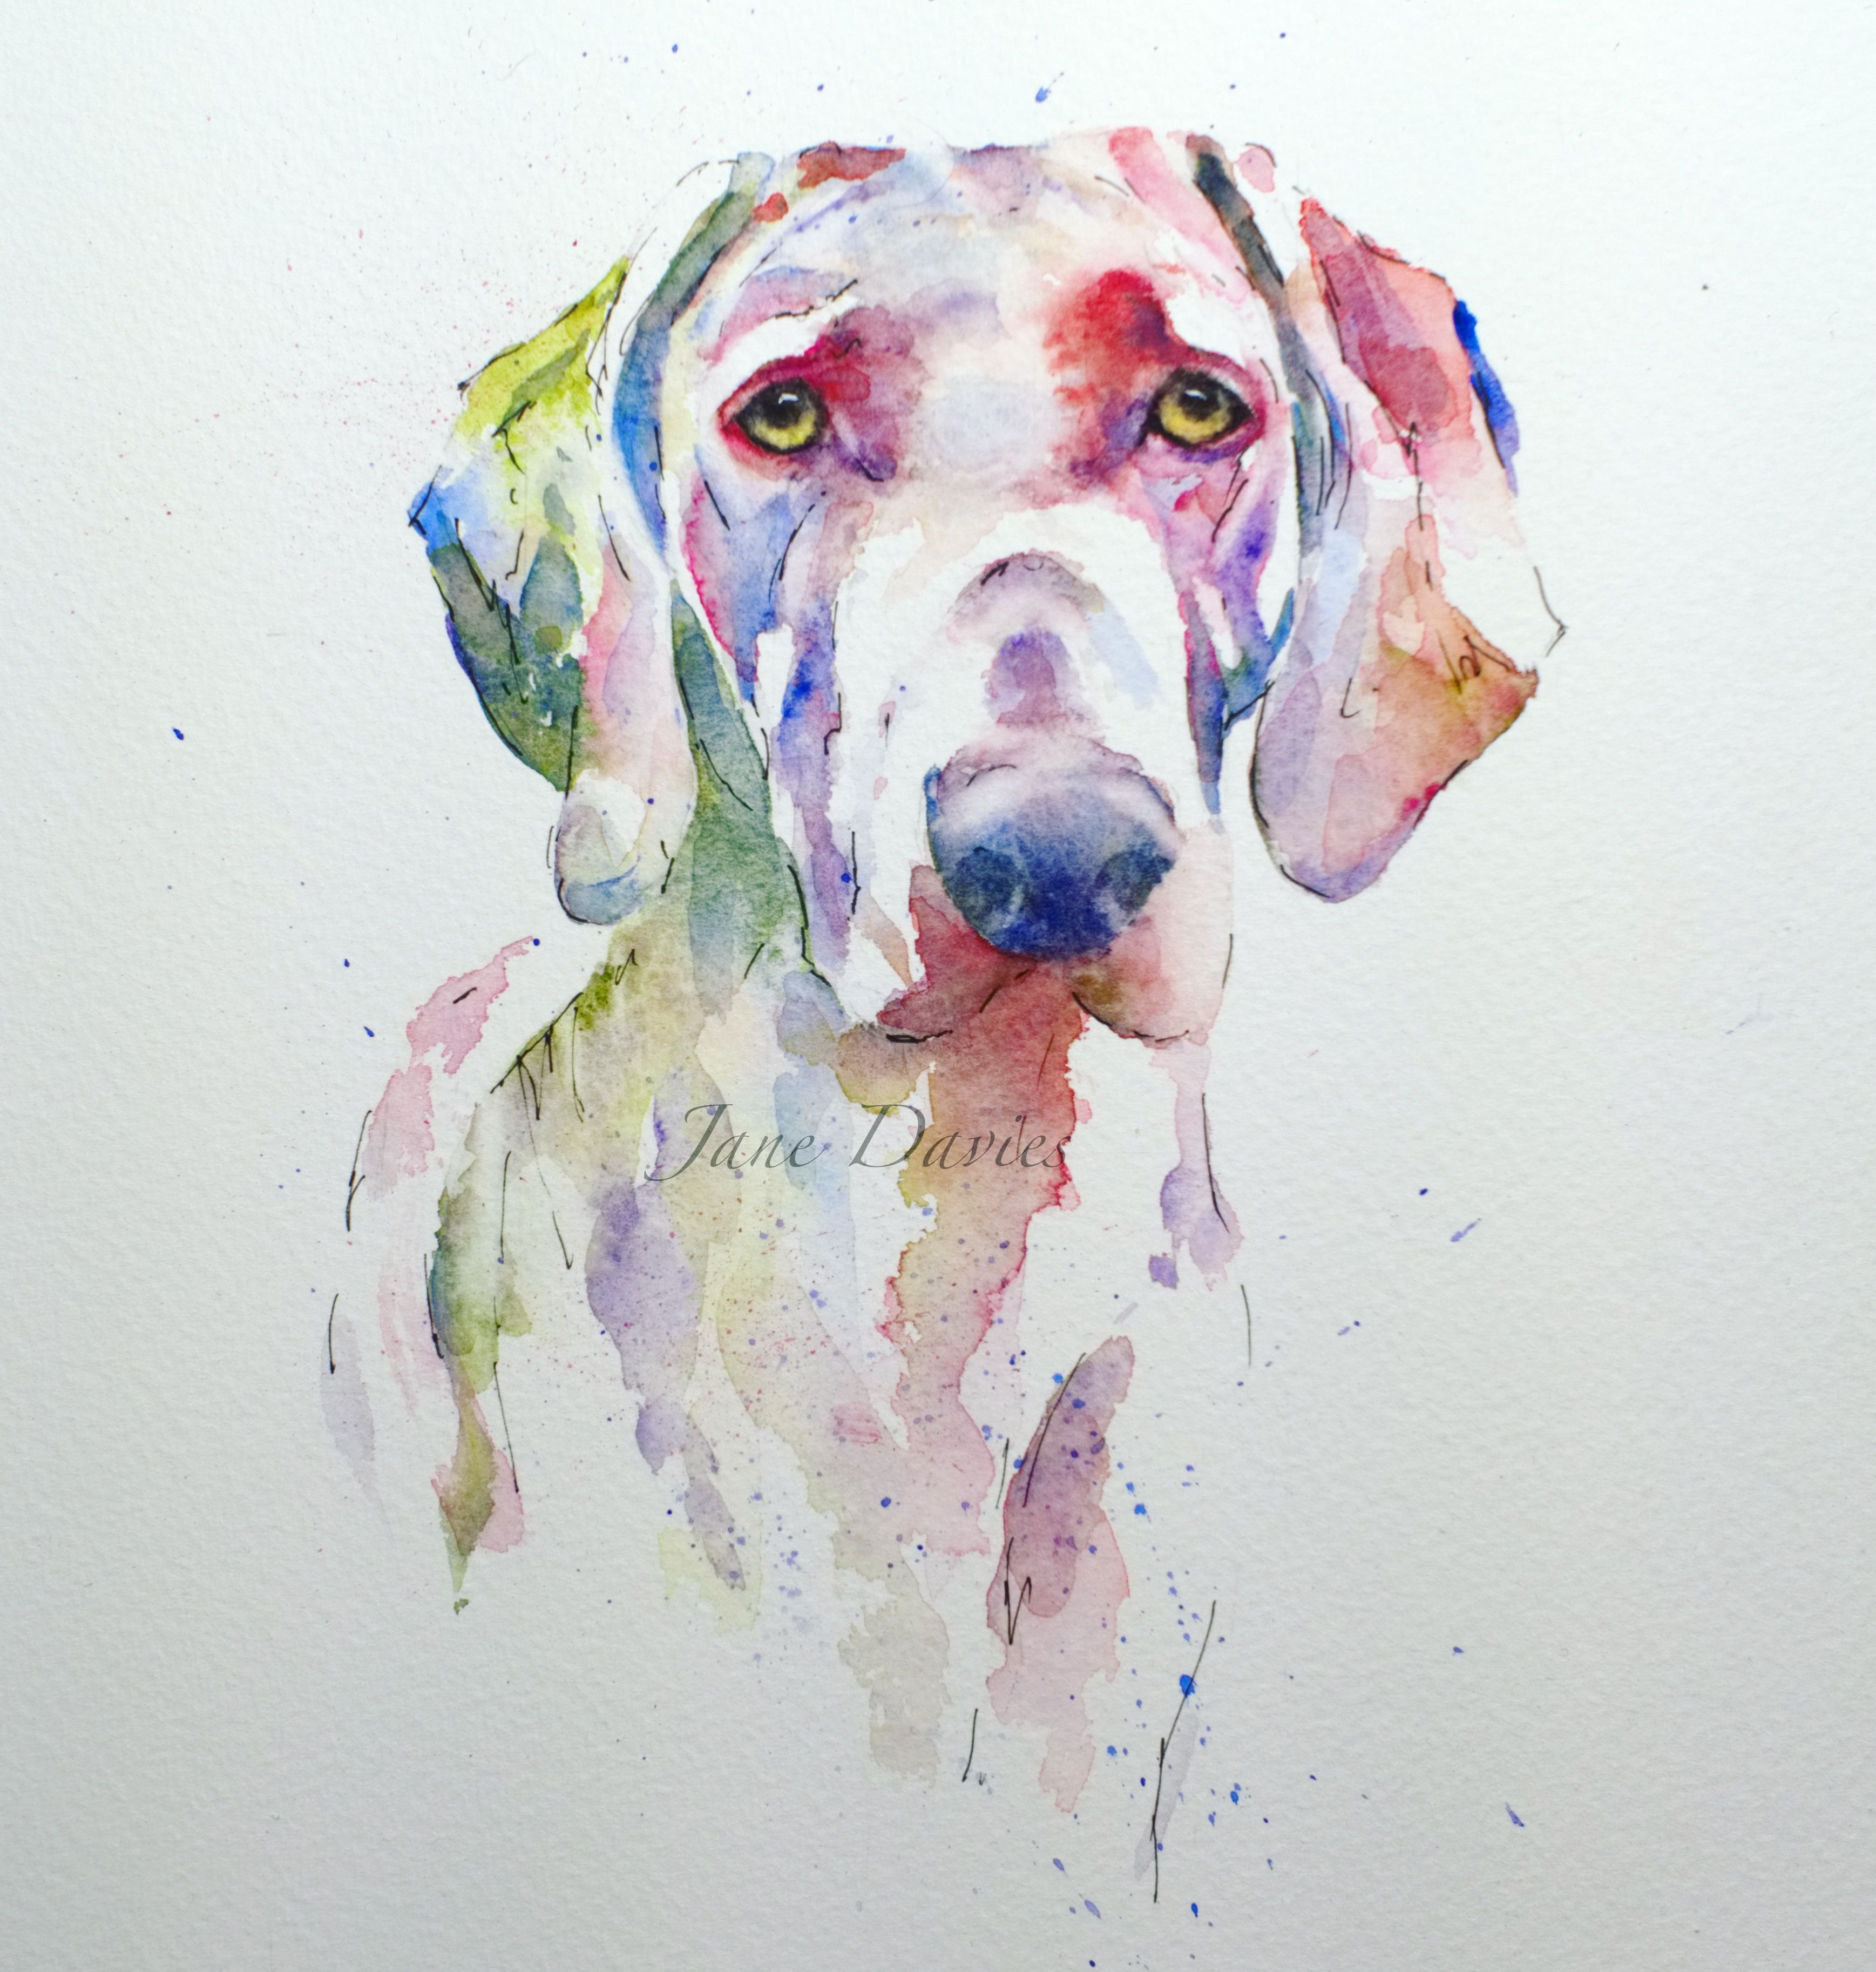 Pet Portrait Of A Weimaraner Painted By Watercolour Artist Jane